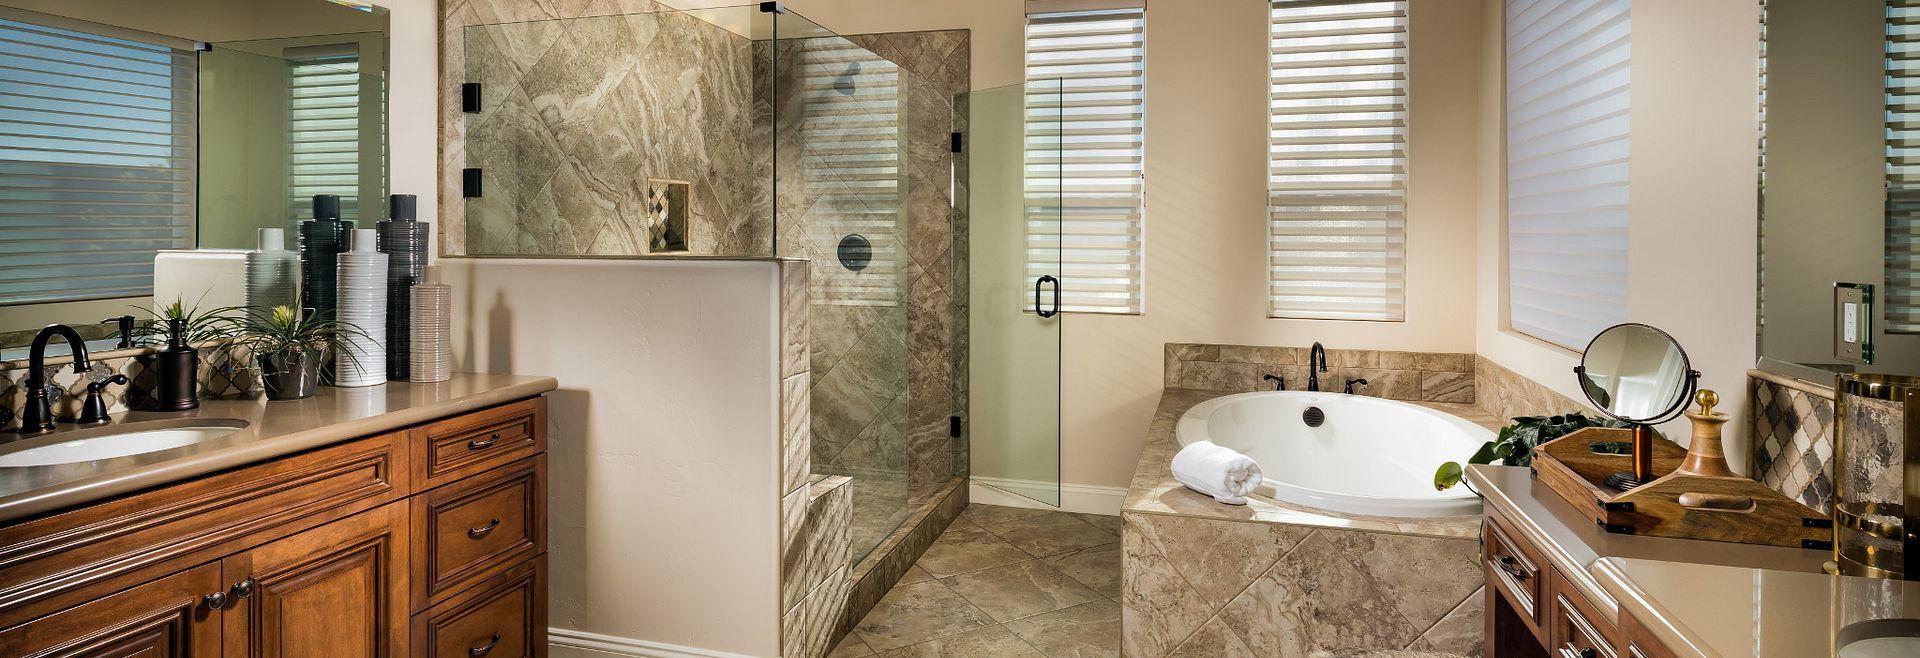 Trilogy Monarch Dunes Avila Master Bathroom